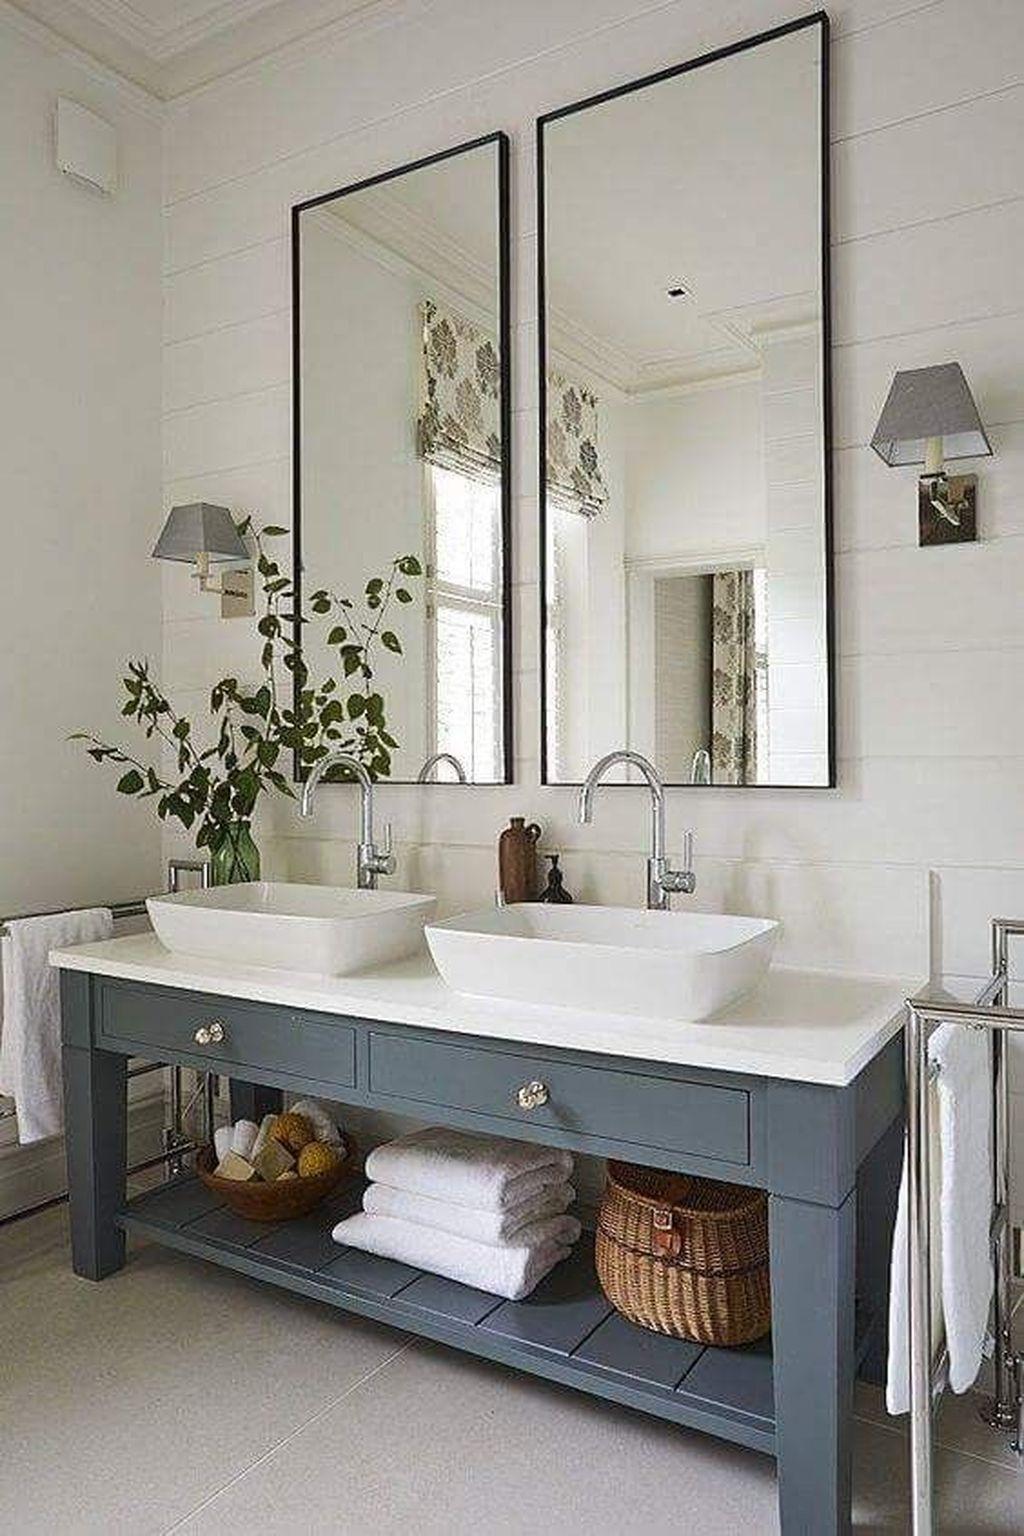 Inspiring Small Modern Farmhouse Bathroom Design Ideas 07